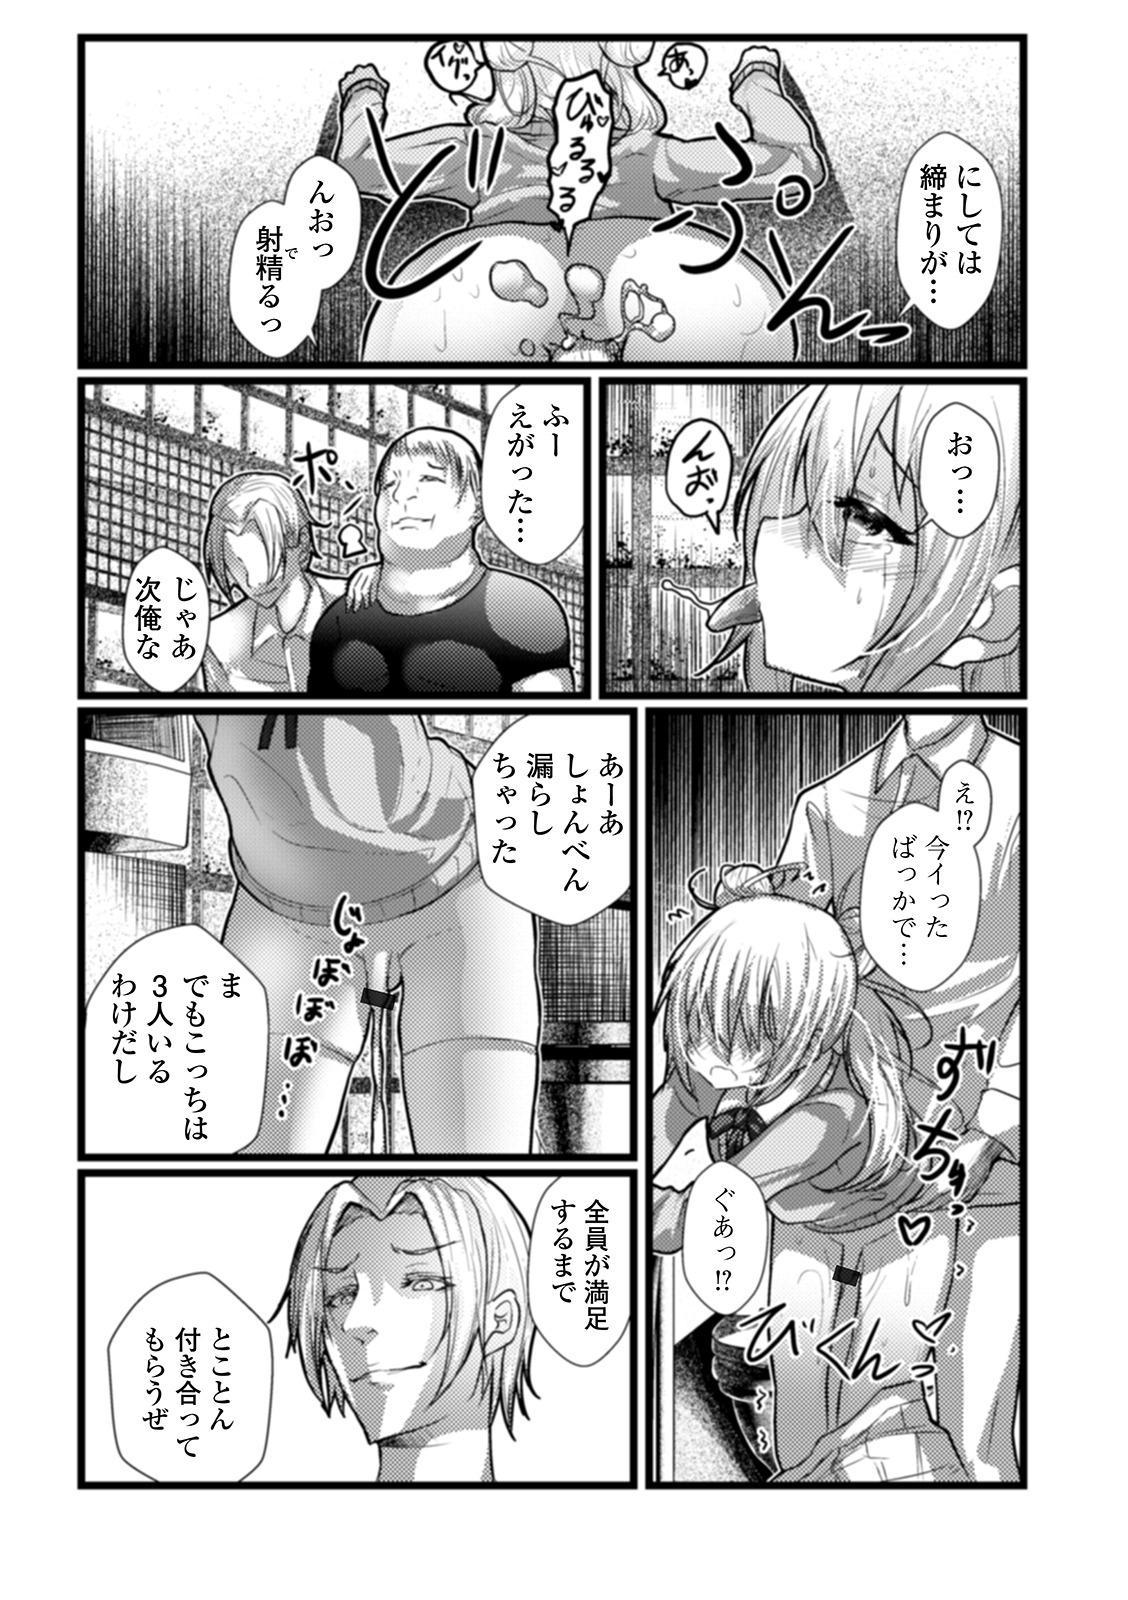 Gekkan Web Otoko no Ko-llection! S Vol. 53 62